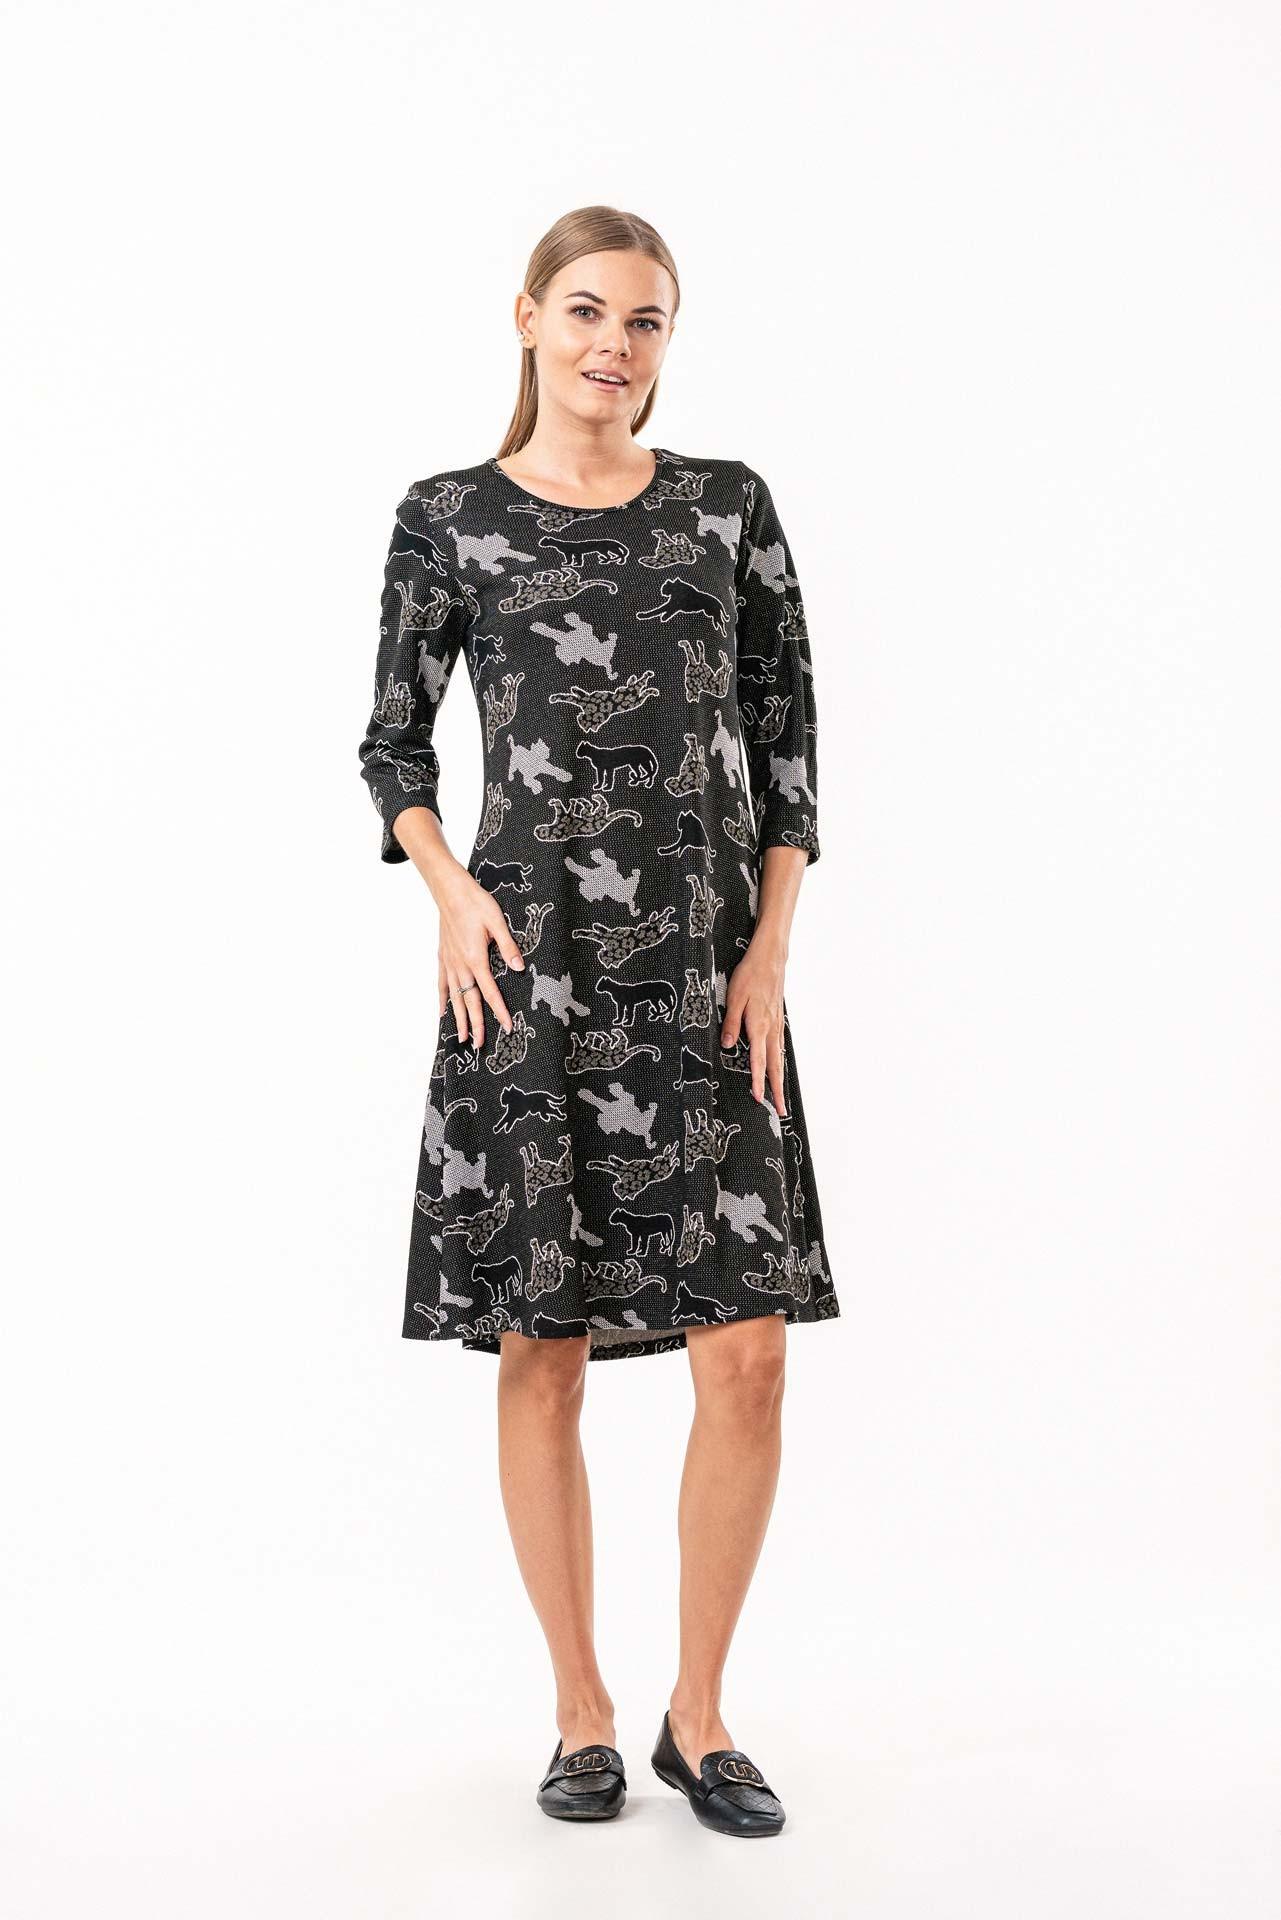 Dámské šaty ESME